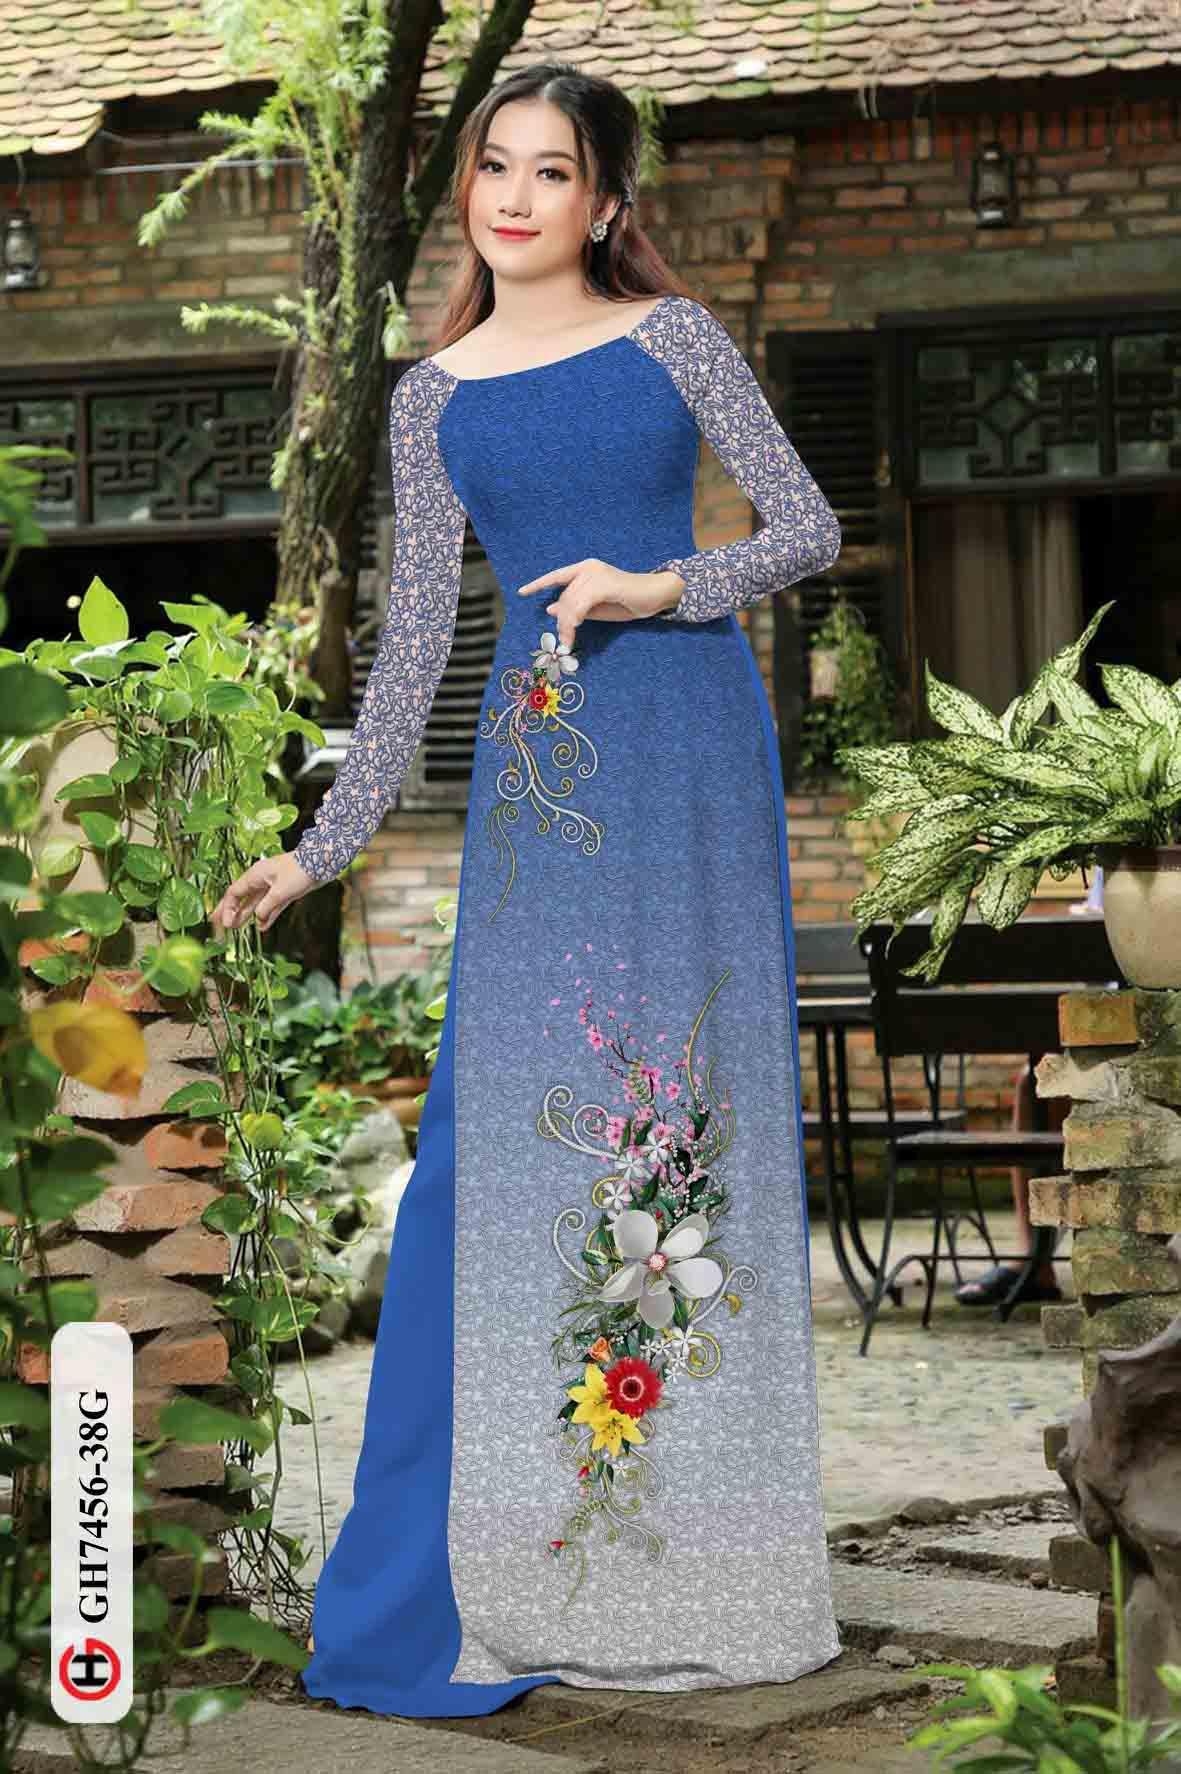 Vải áo dài hoa in 3D AD GH7456 37